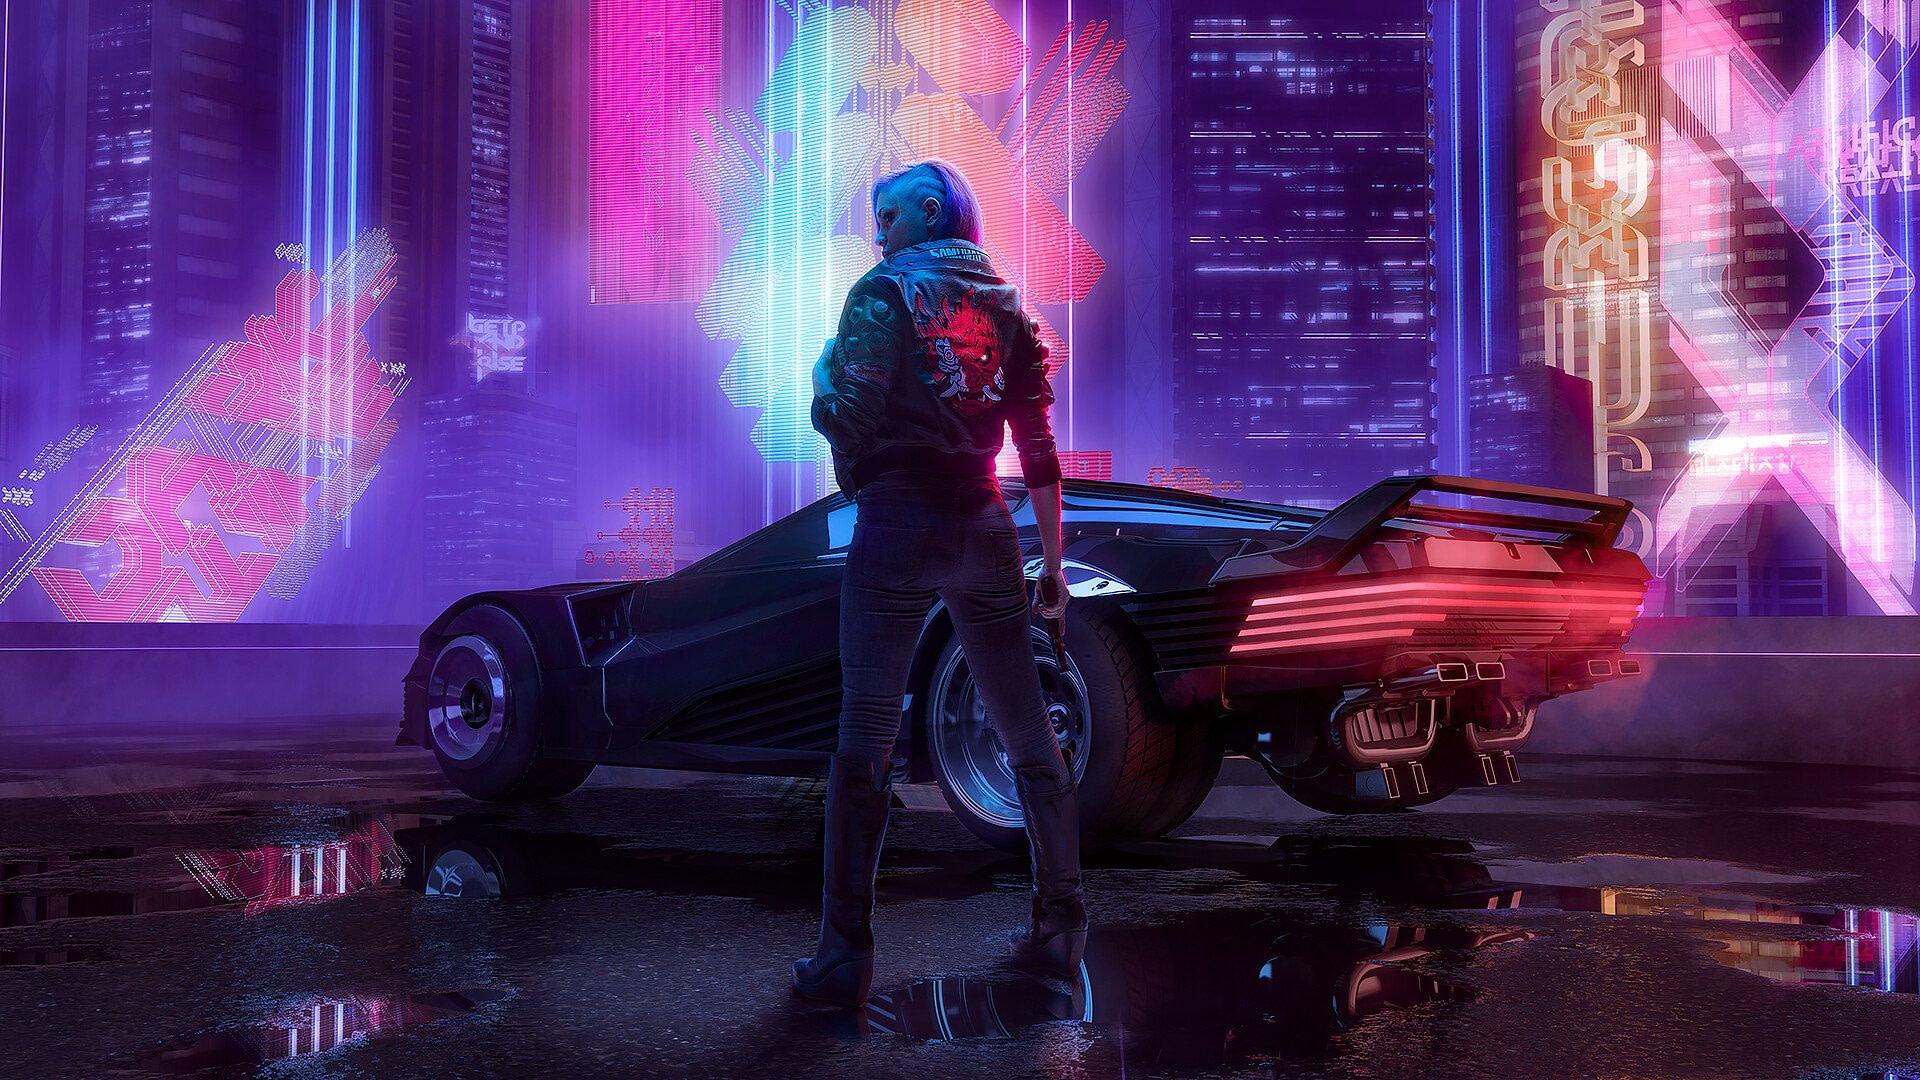 Cuál es la mejor tarjeta gráfica para Cyberpunk 2077